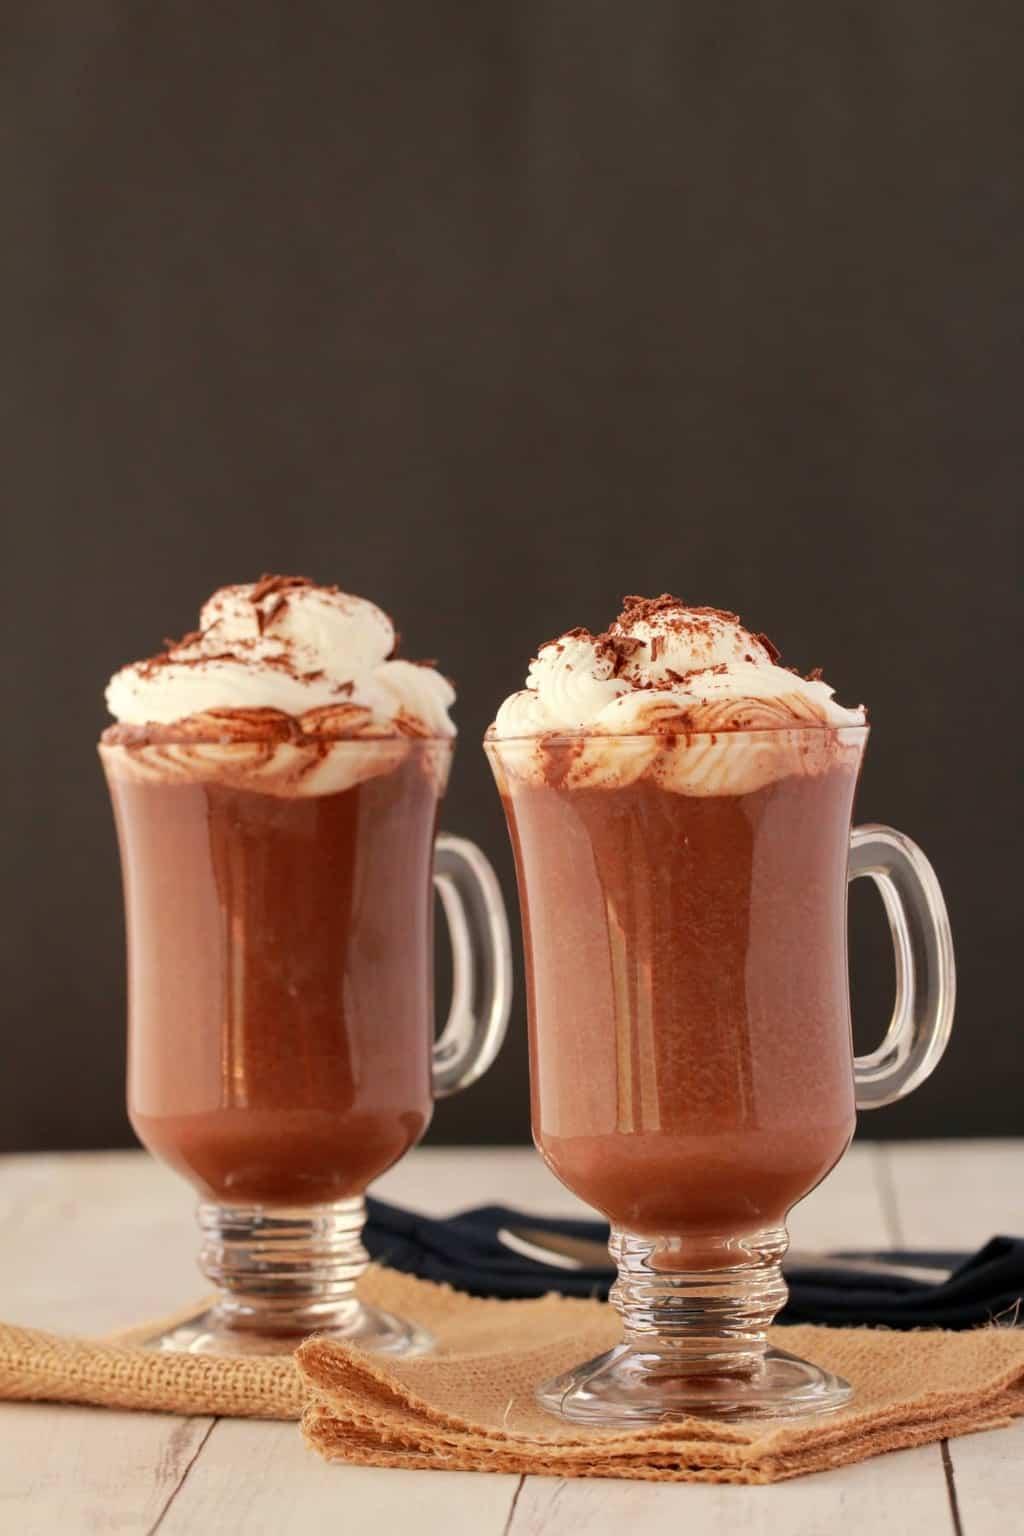 Vegan Hot Chocolate in glass mugs standing against a dark background.